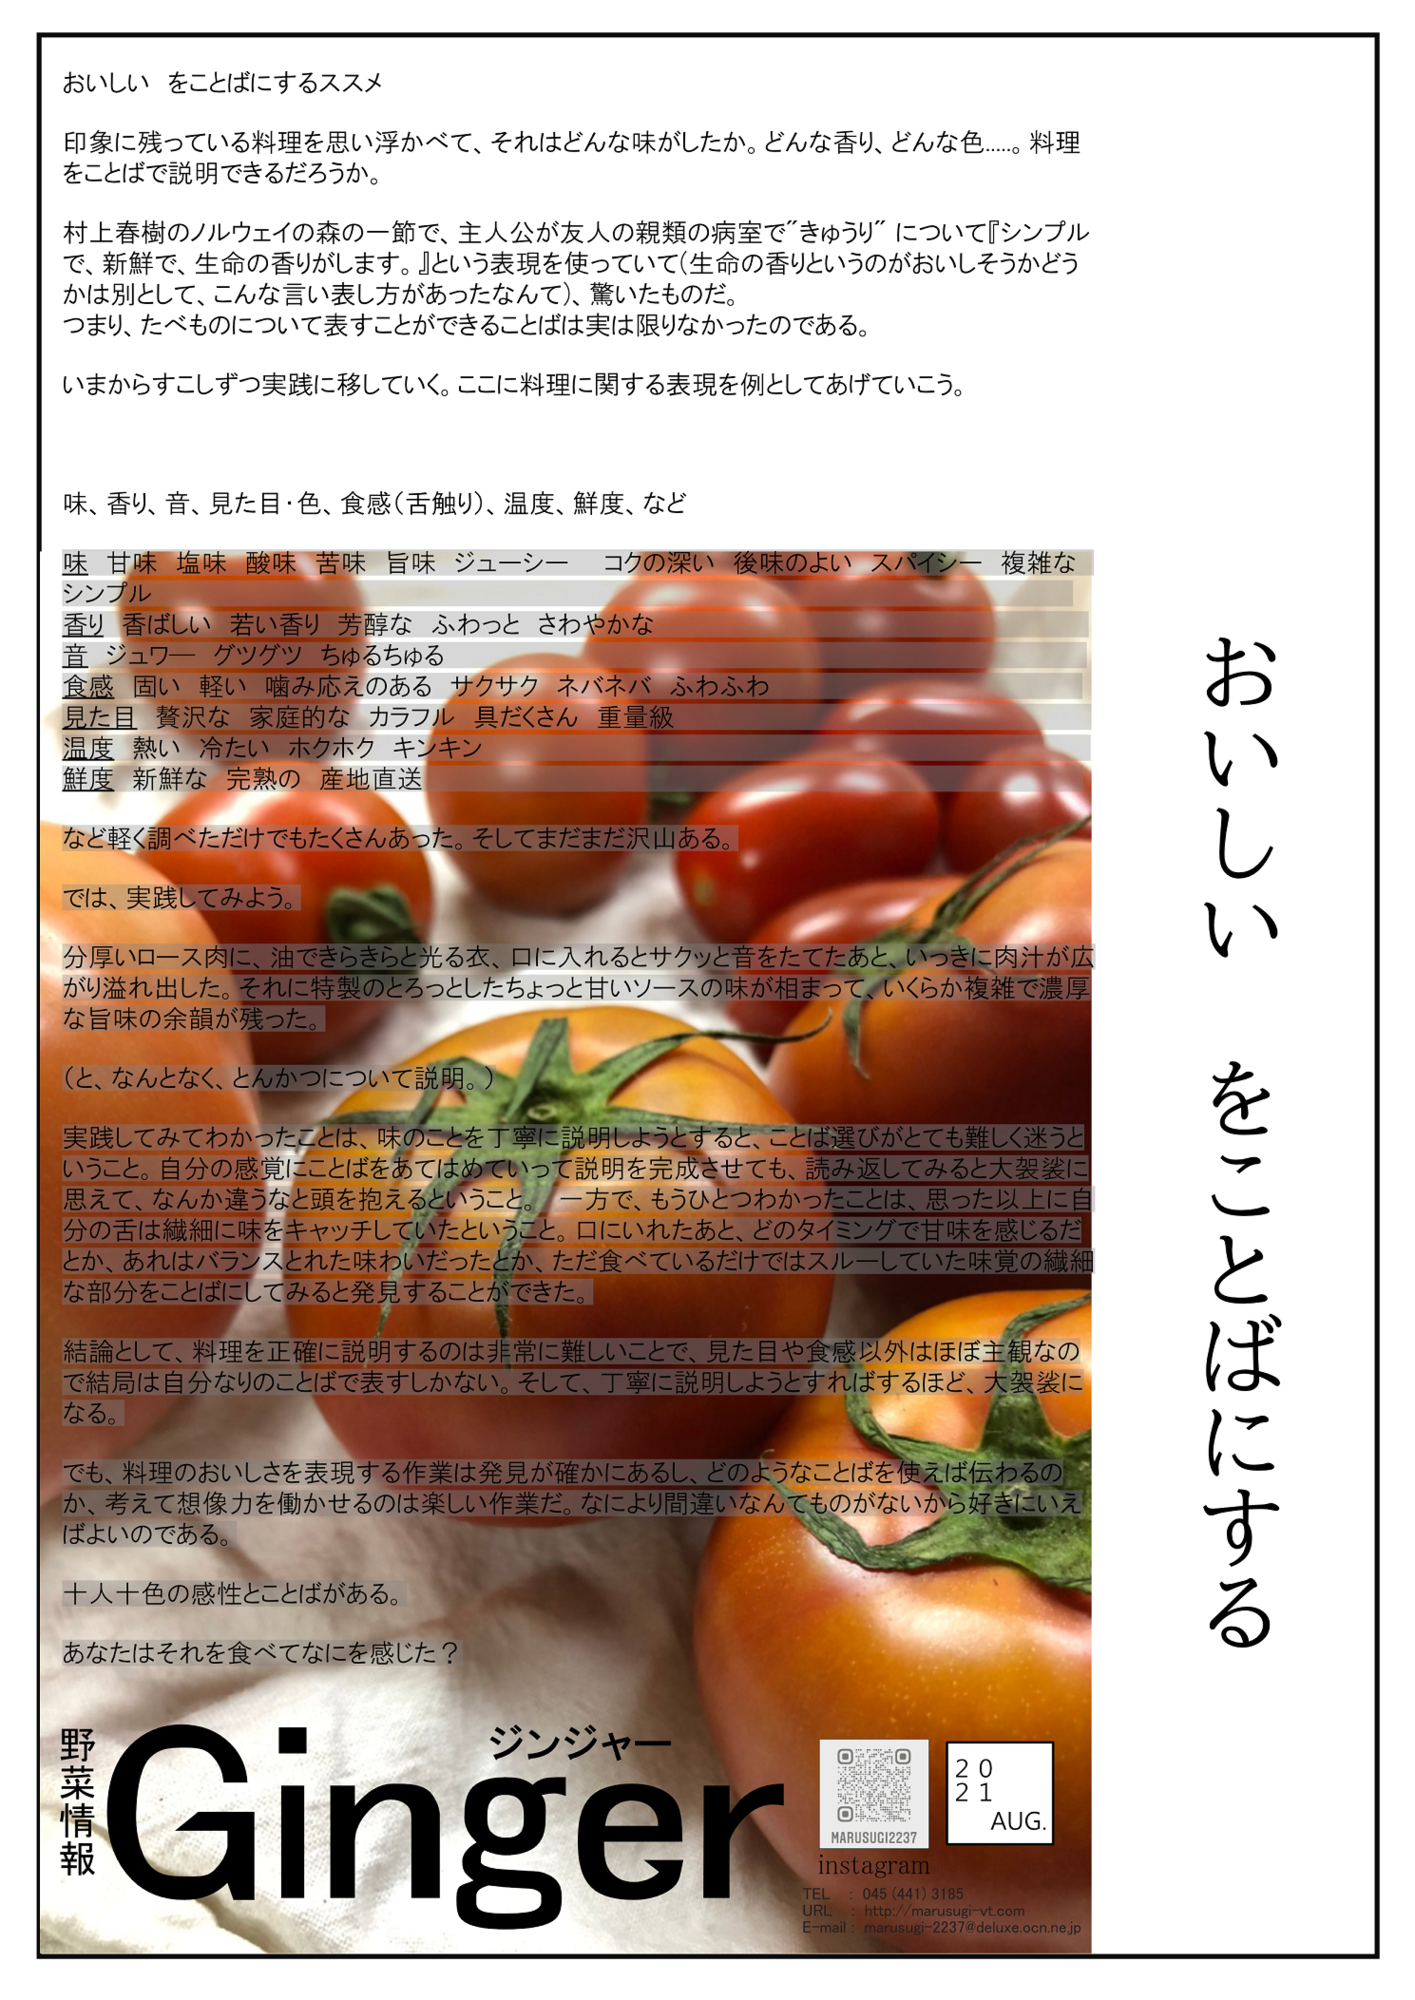 f:id:marusugi-2237:20210804110217p:plain